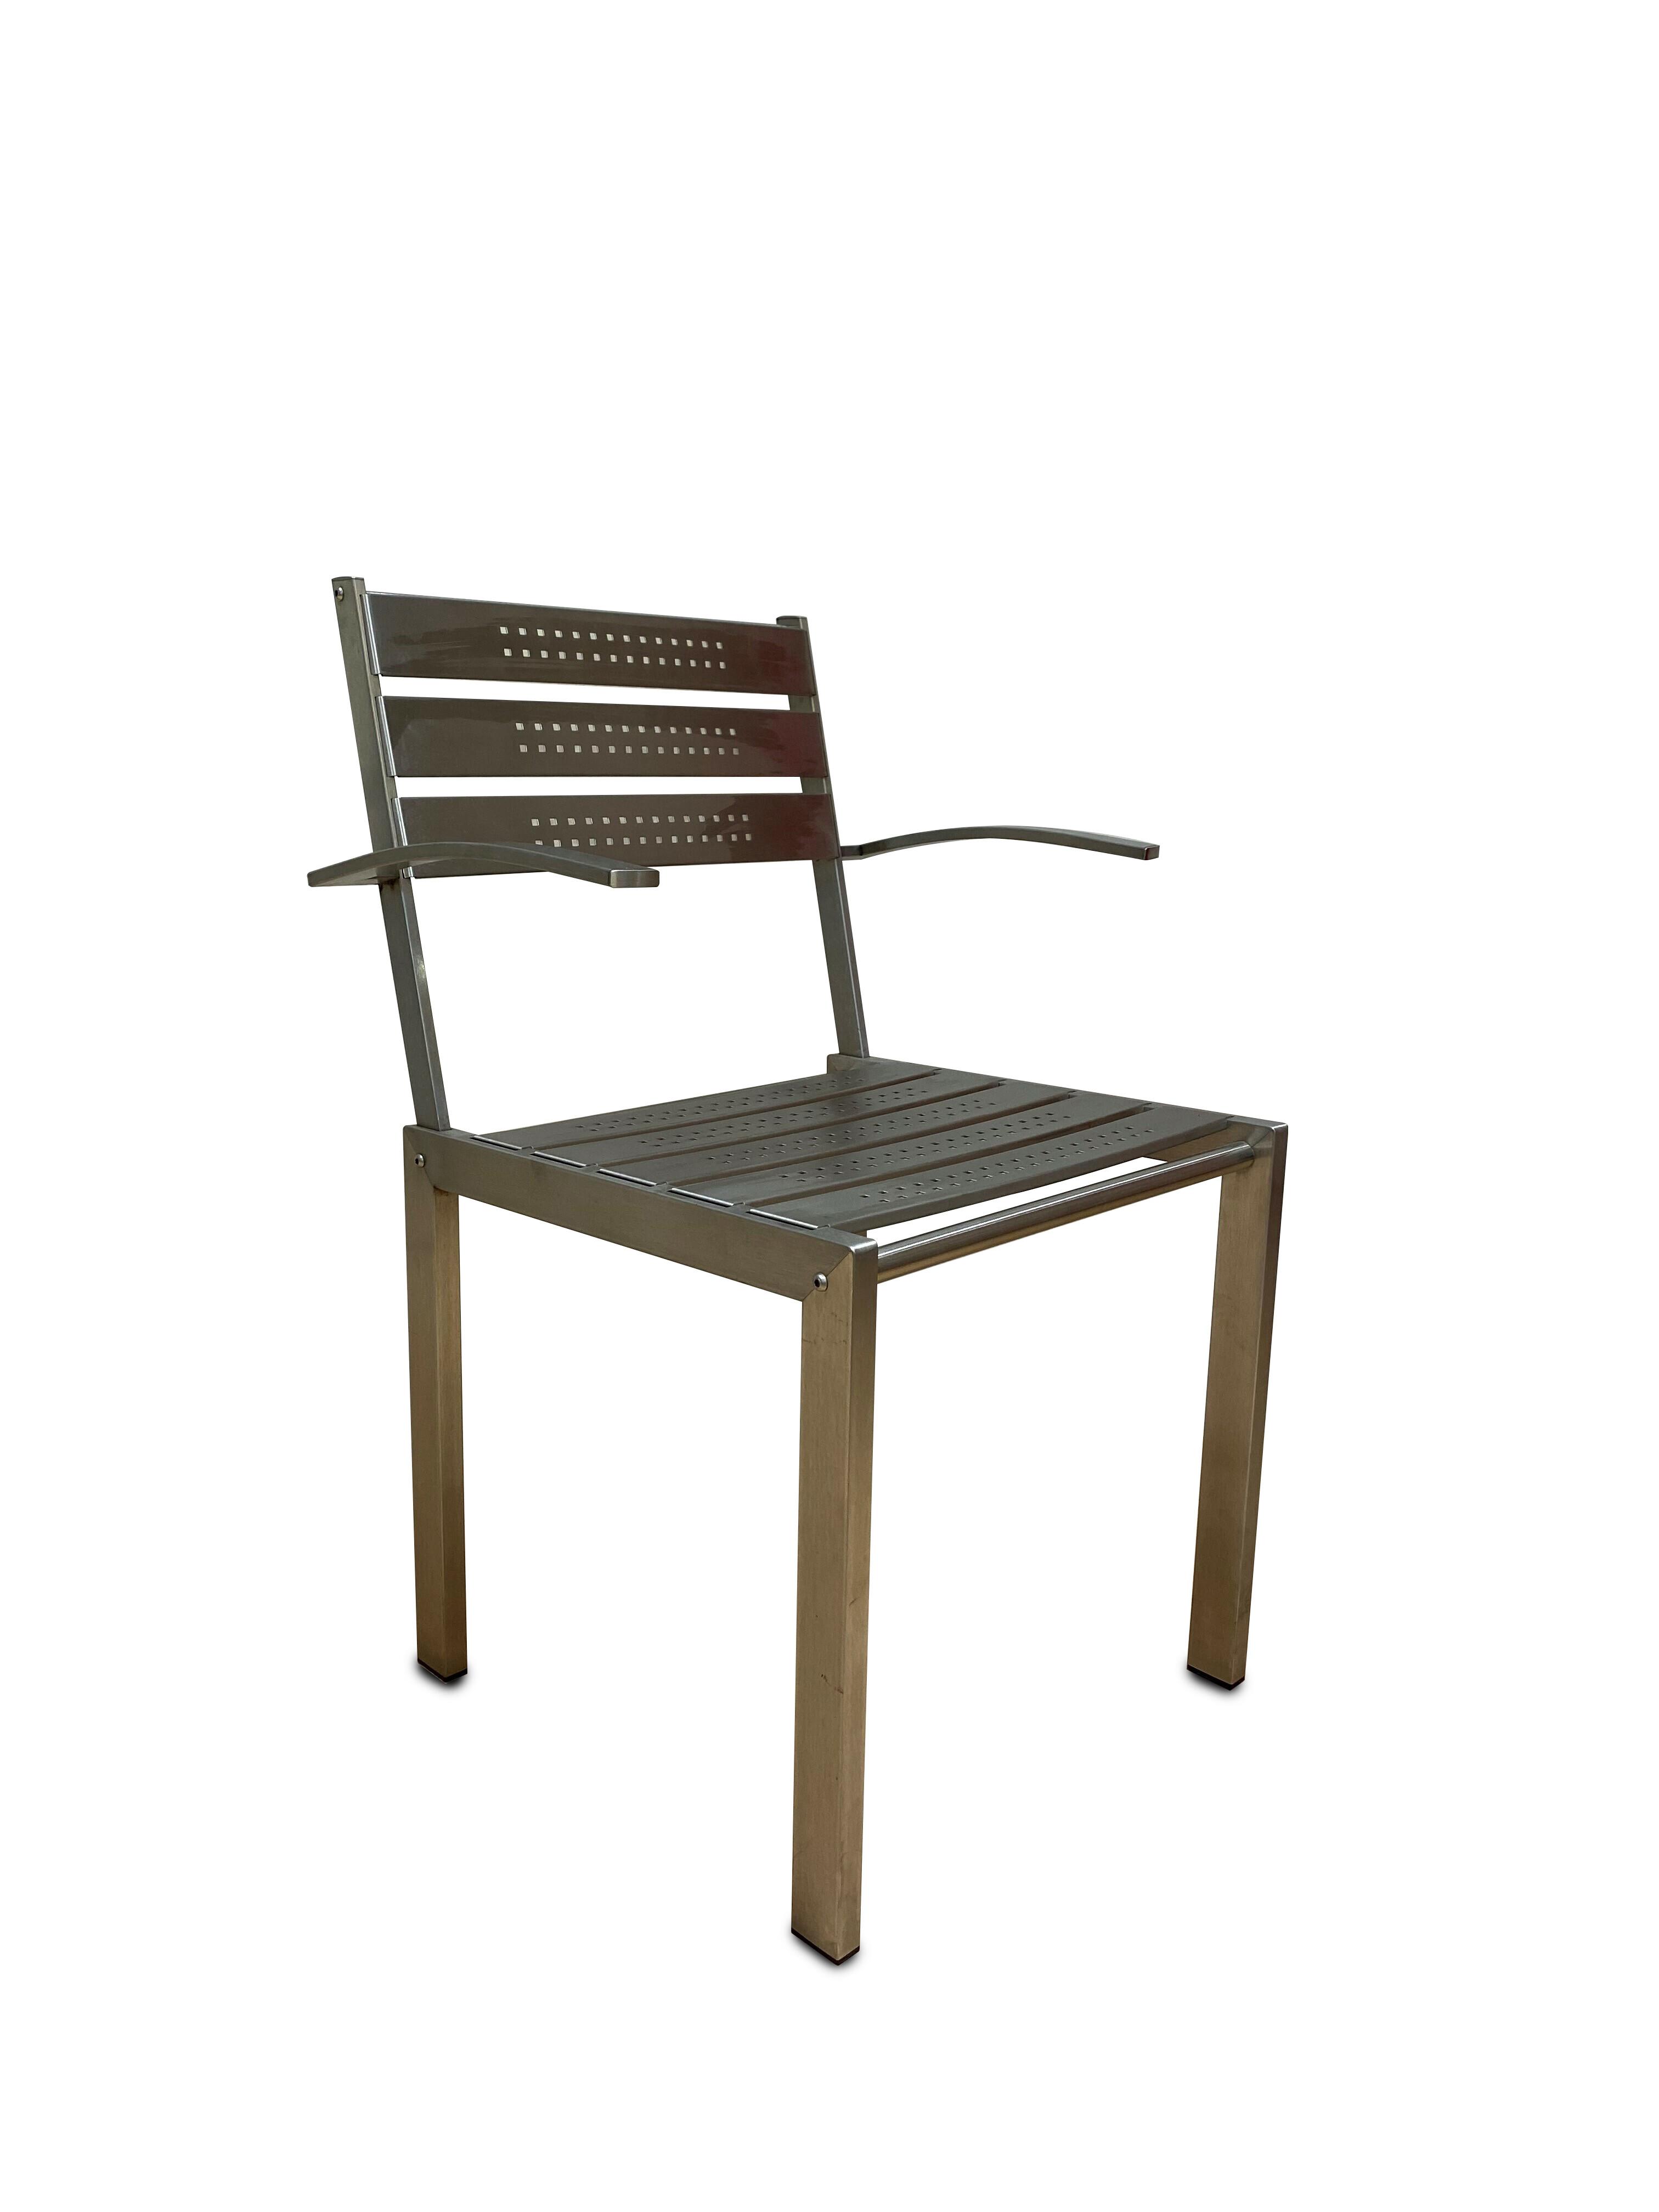 Hutter Armlehnstühle Outdoor Modell SIT 2 Stück 05